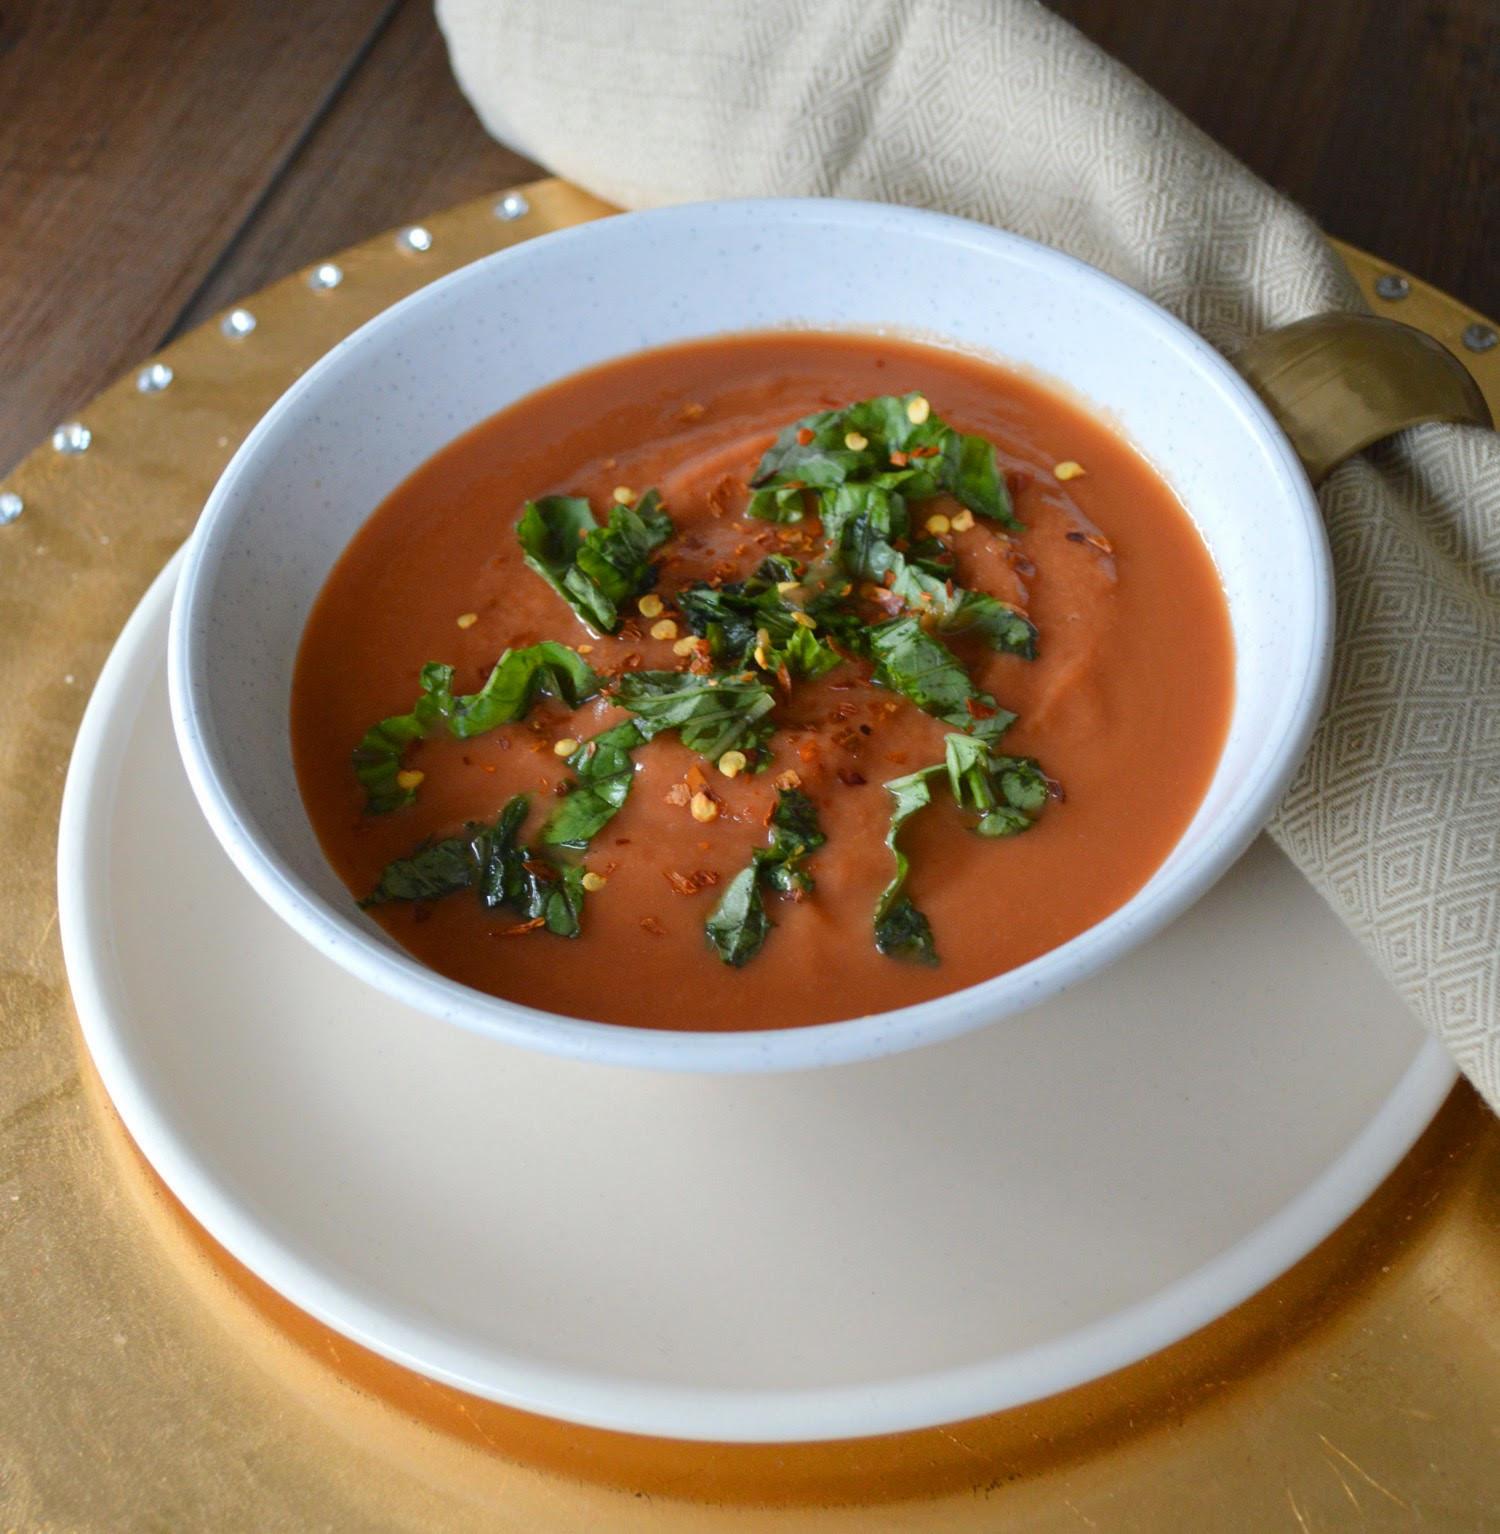 Creamy Tomato Soup  Paleo Girl s Kitchen Creamy Tomato Soup